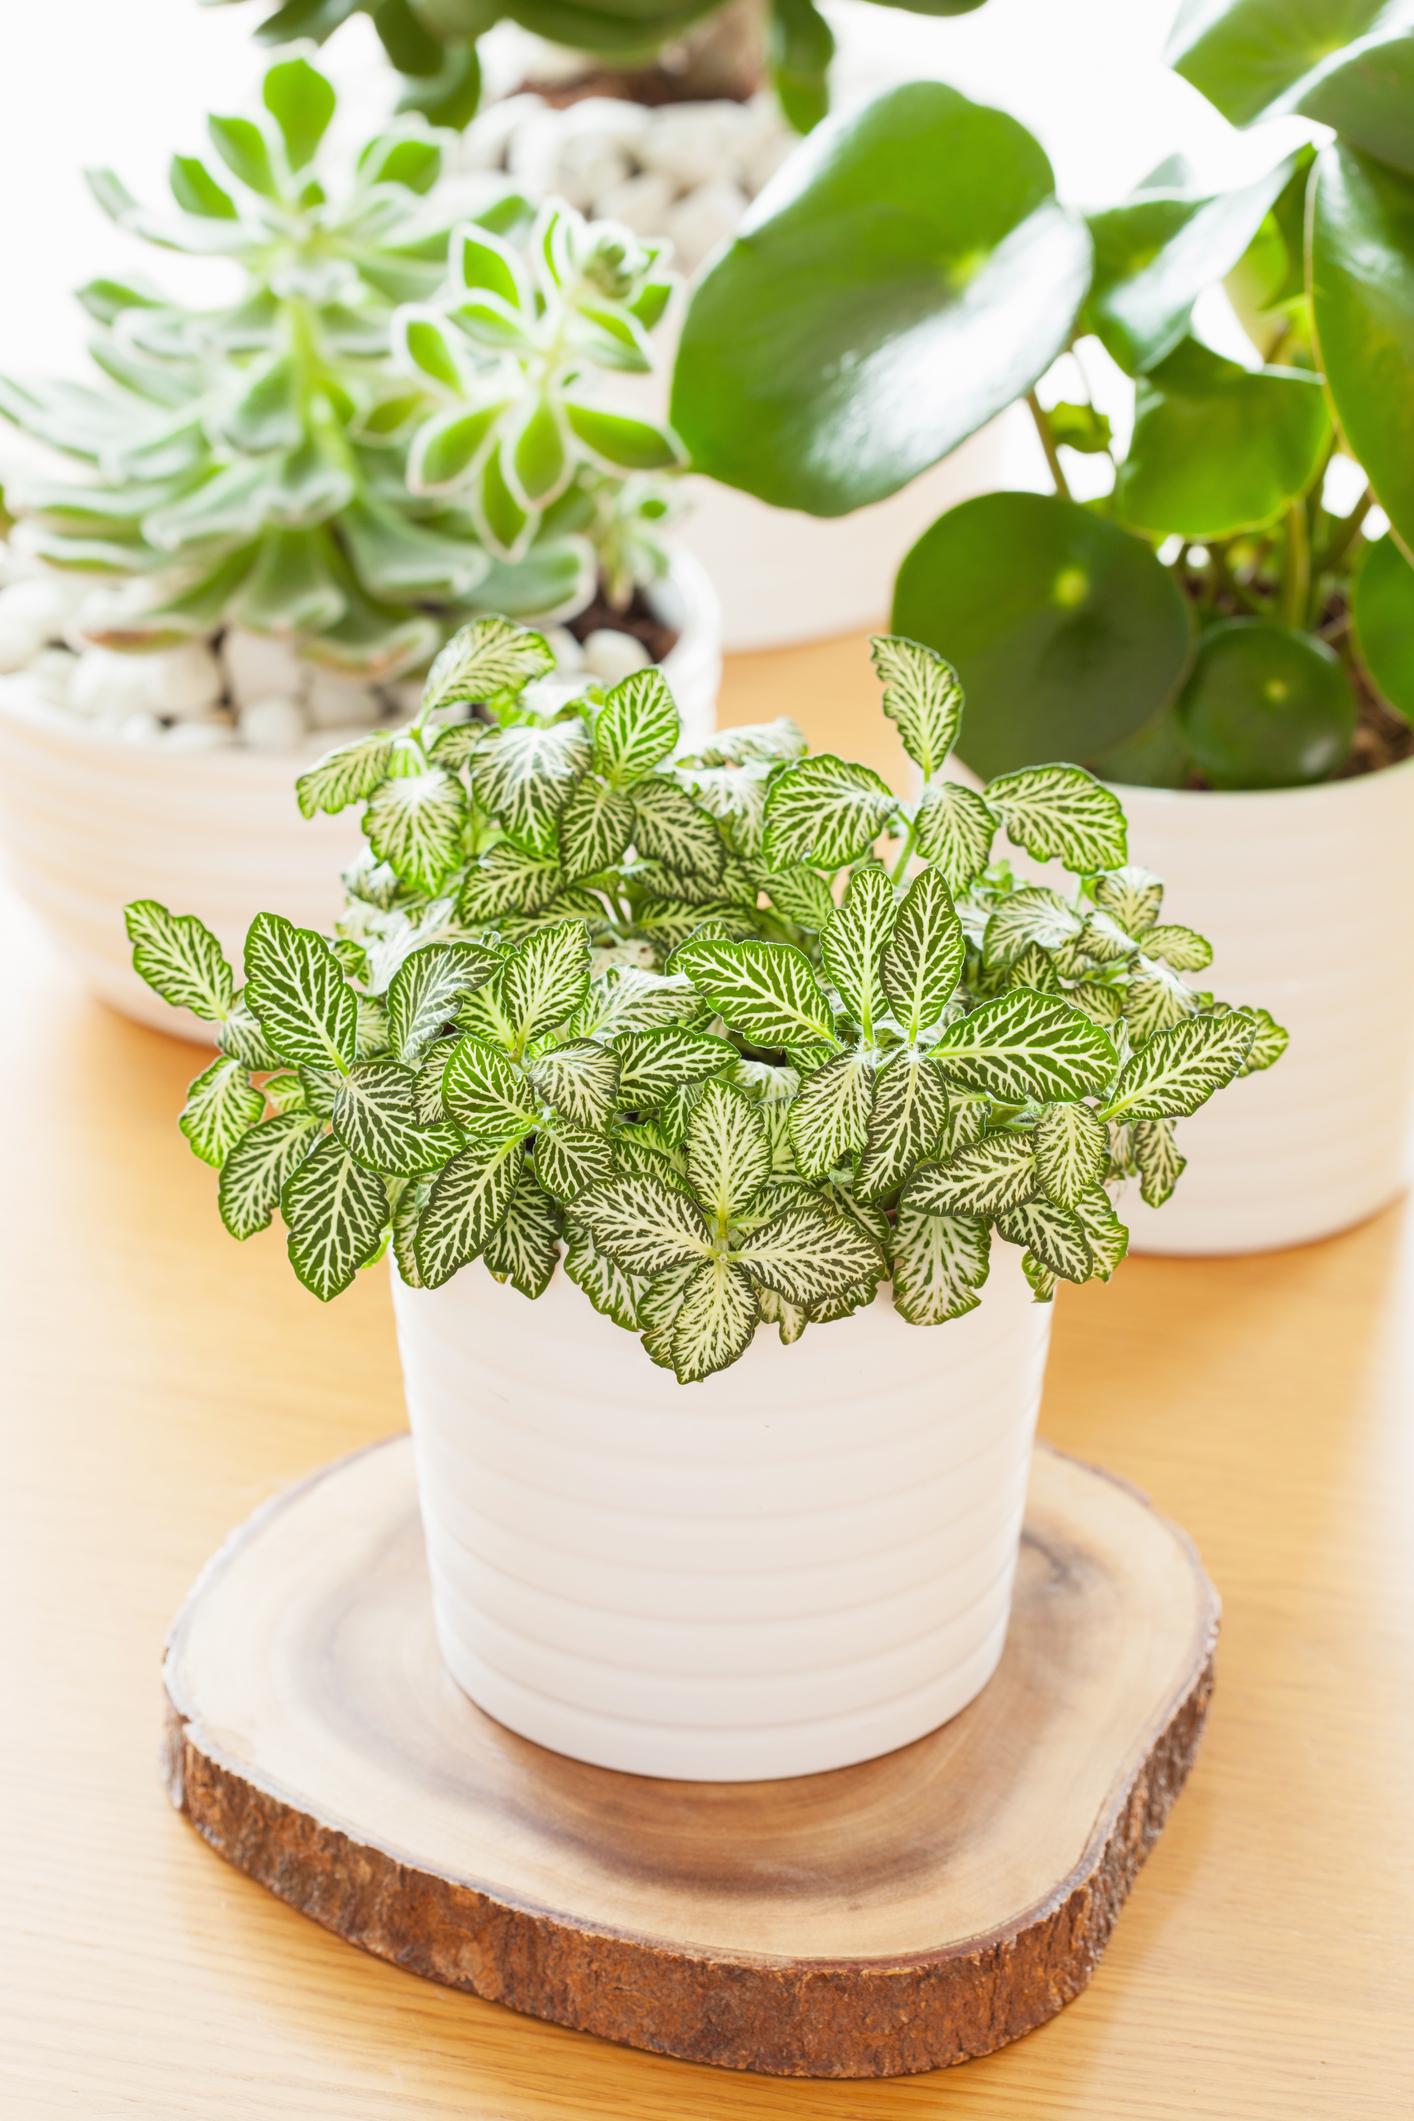 25 easy houseplants easy to care for indoor plants. Black Bedroom Furniture Sets. Home Design Ideas